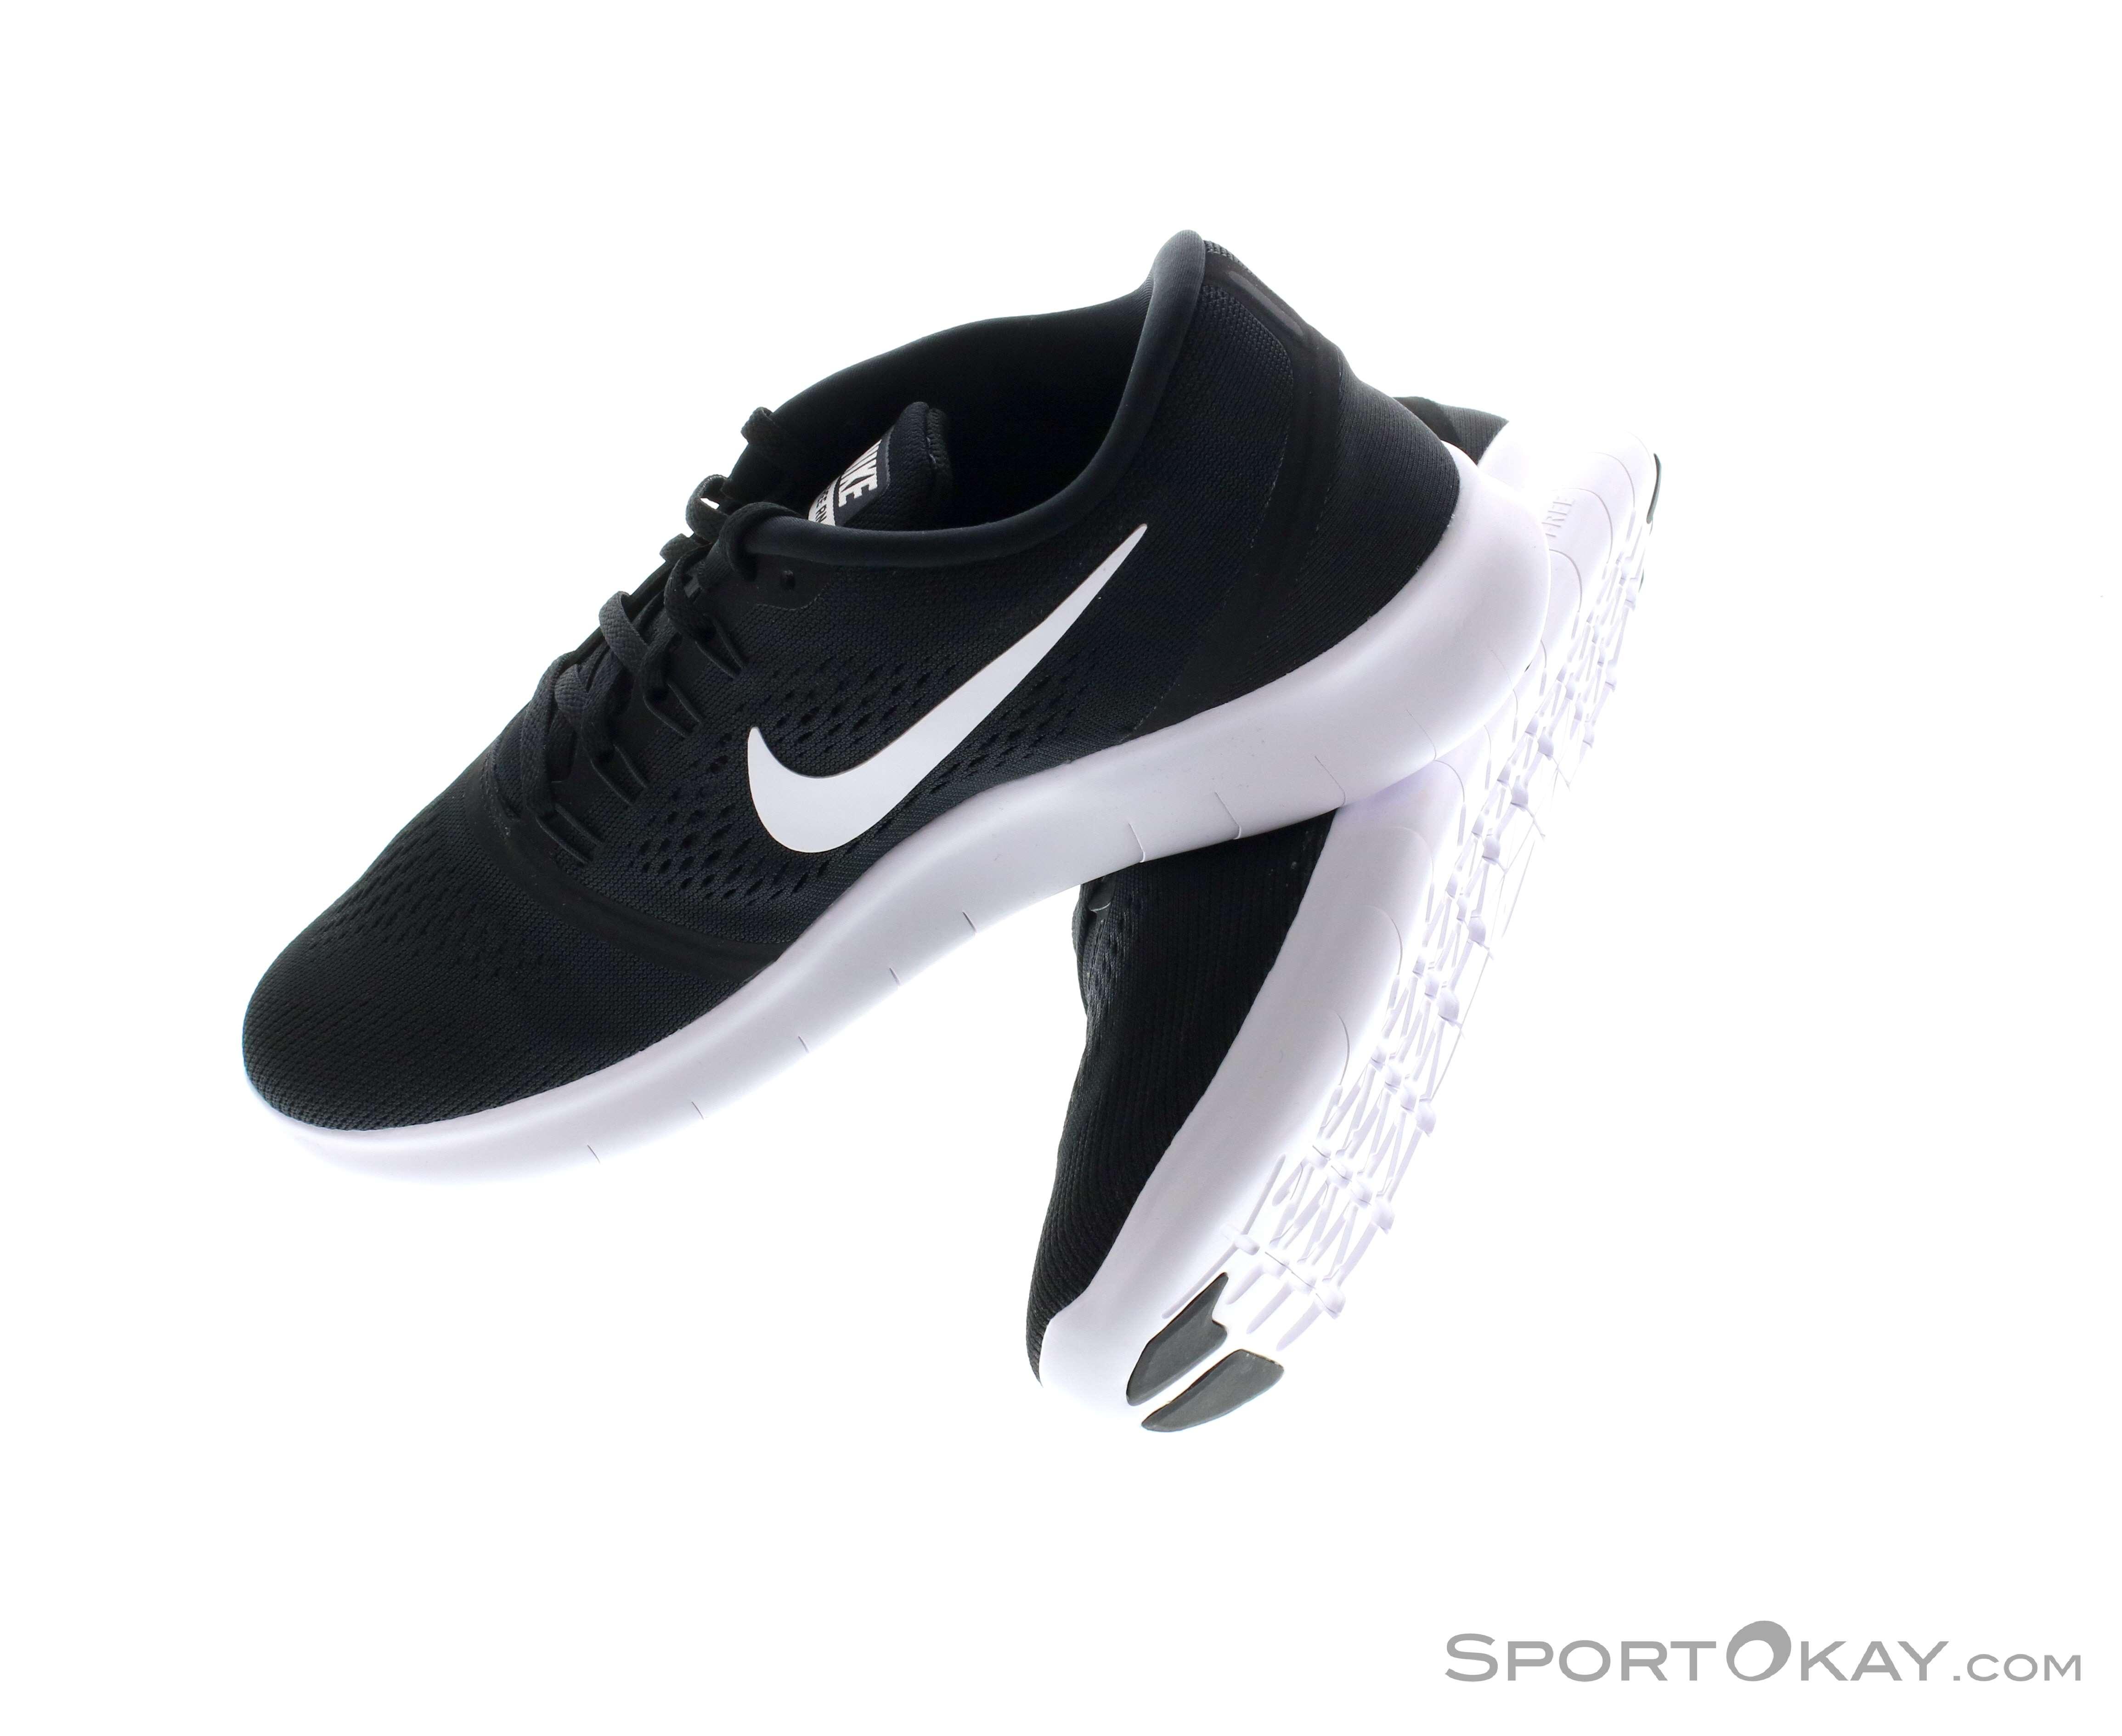 on sale 93e08 234f7 Nike Free RN Uomo Scarpe da Corsa Allround , Nike, Nero, , Uomo,